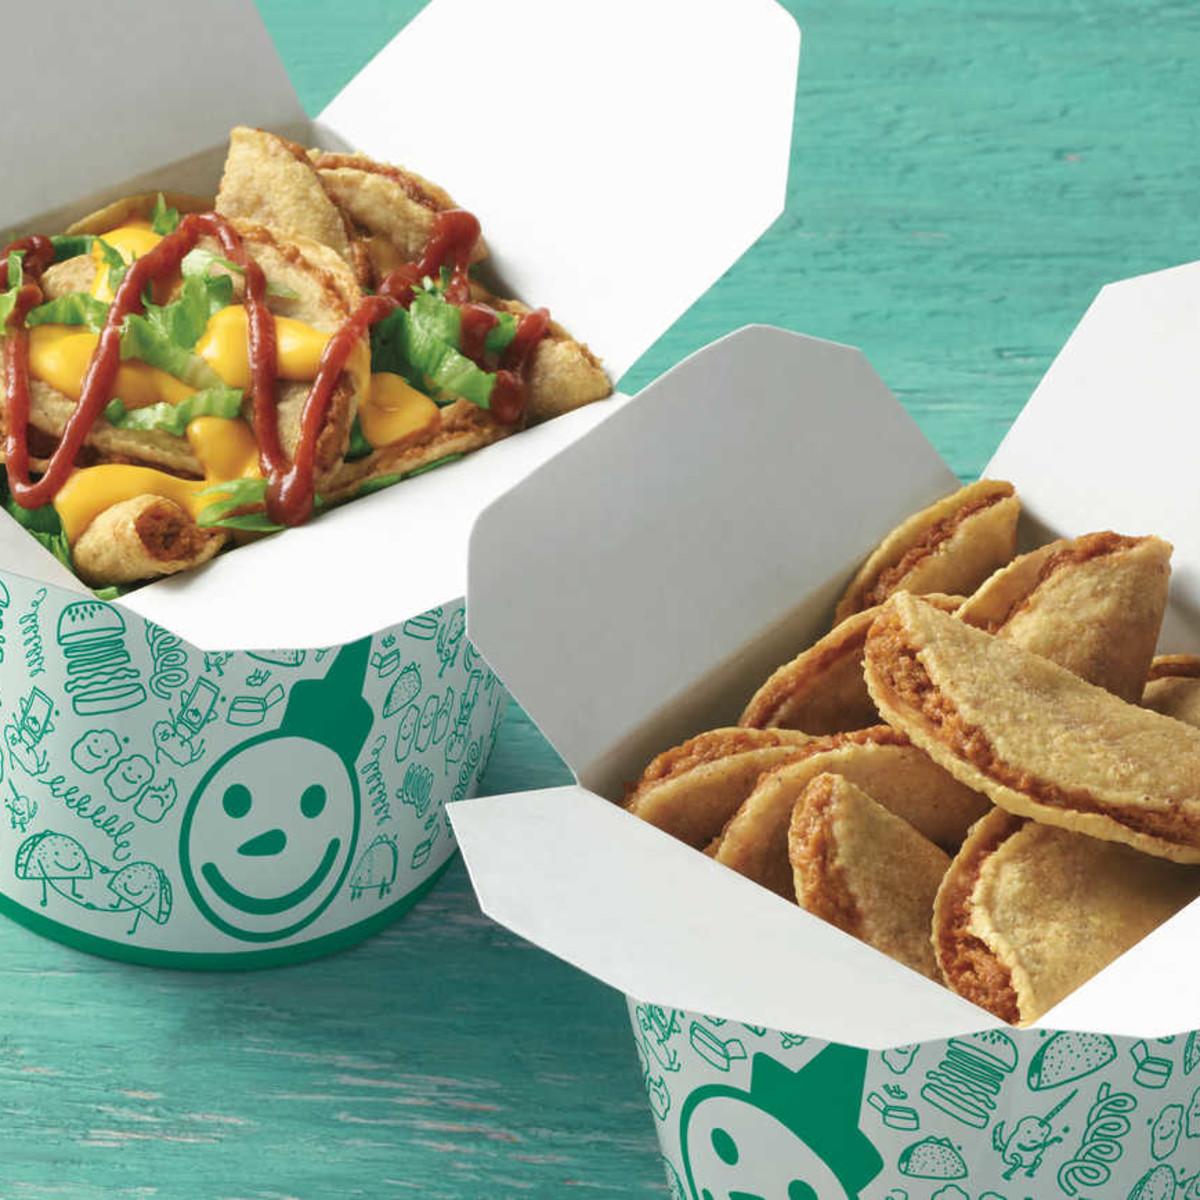 Drive-Thru Gourmet - Jack in the Box tiny tacos